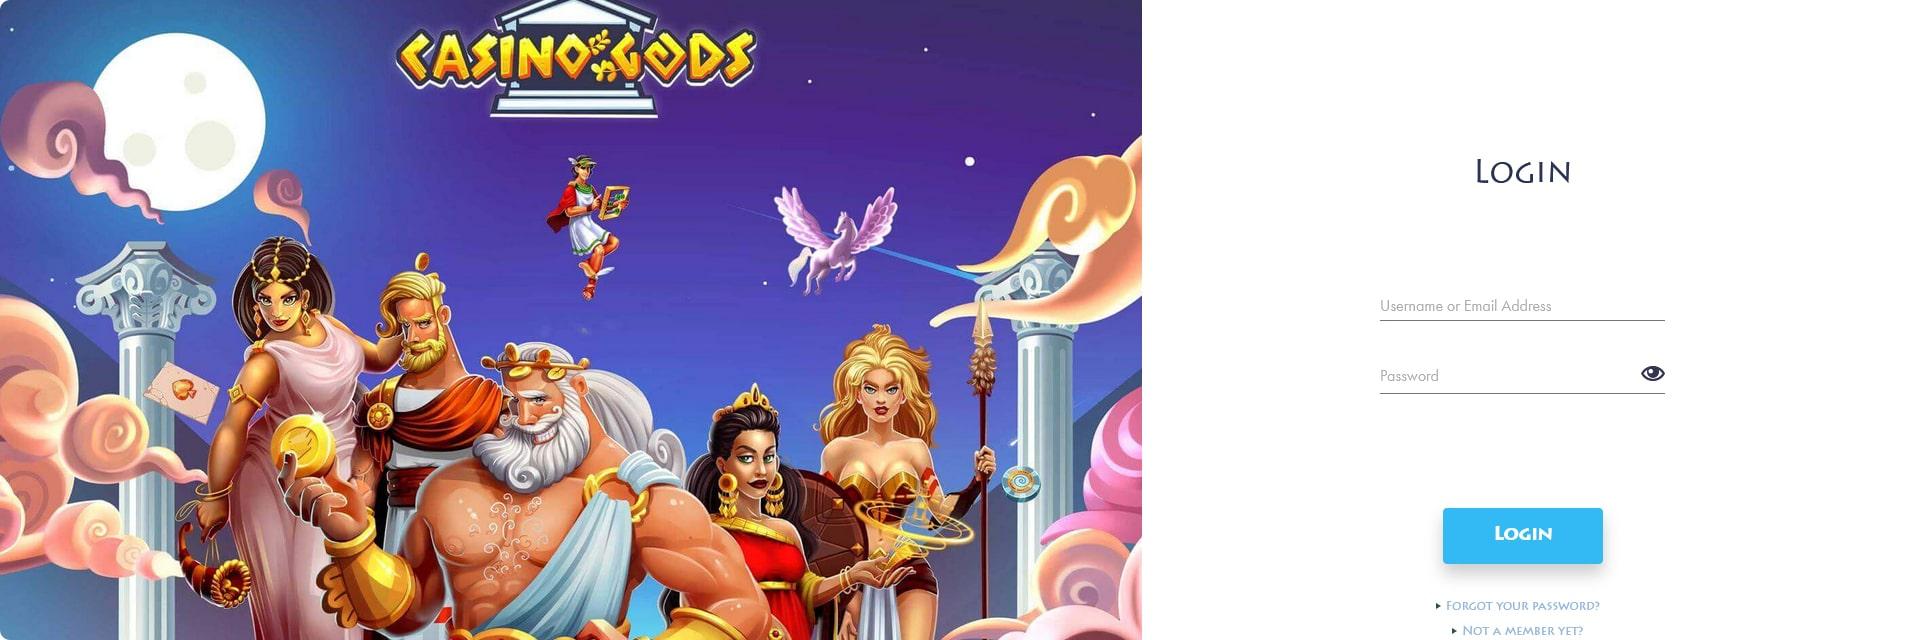 Casino Gods Login.